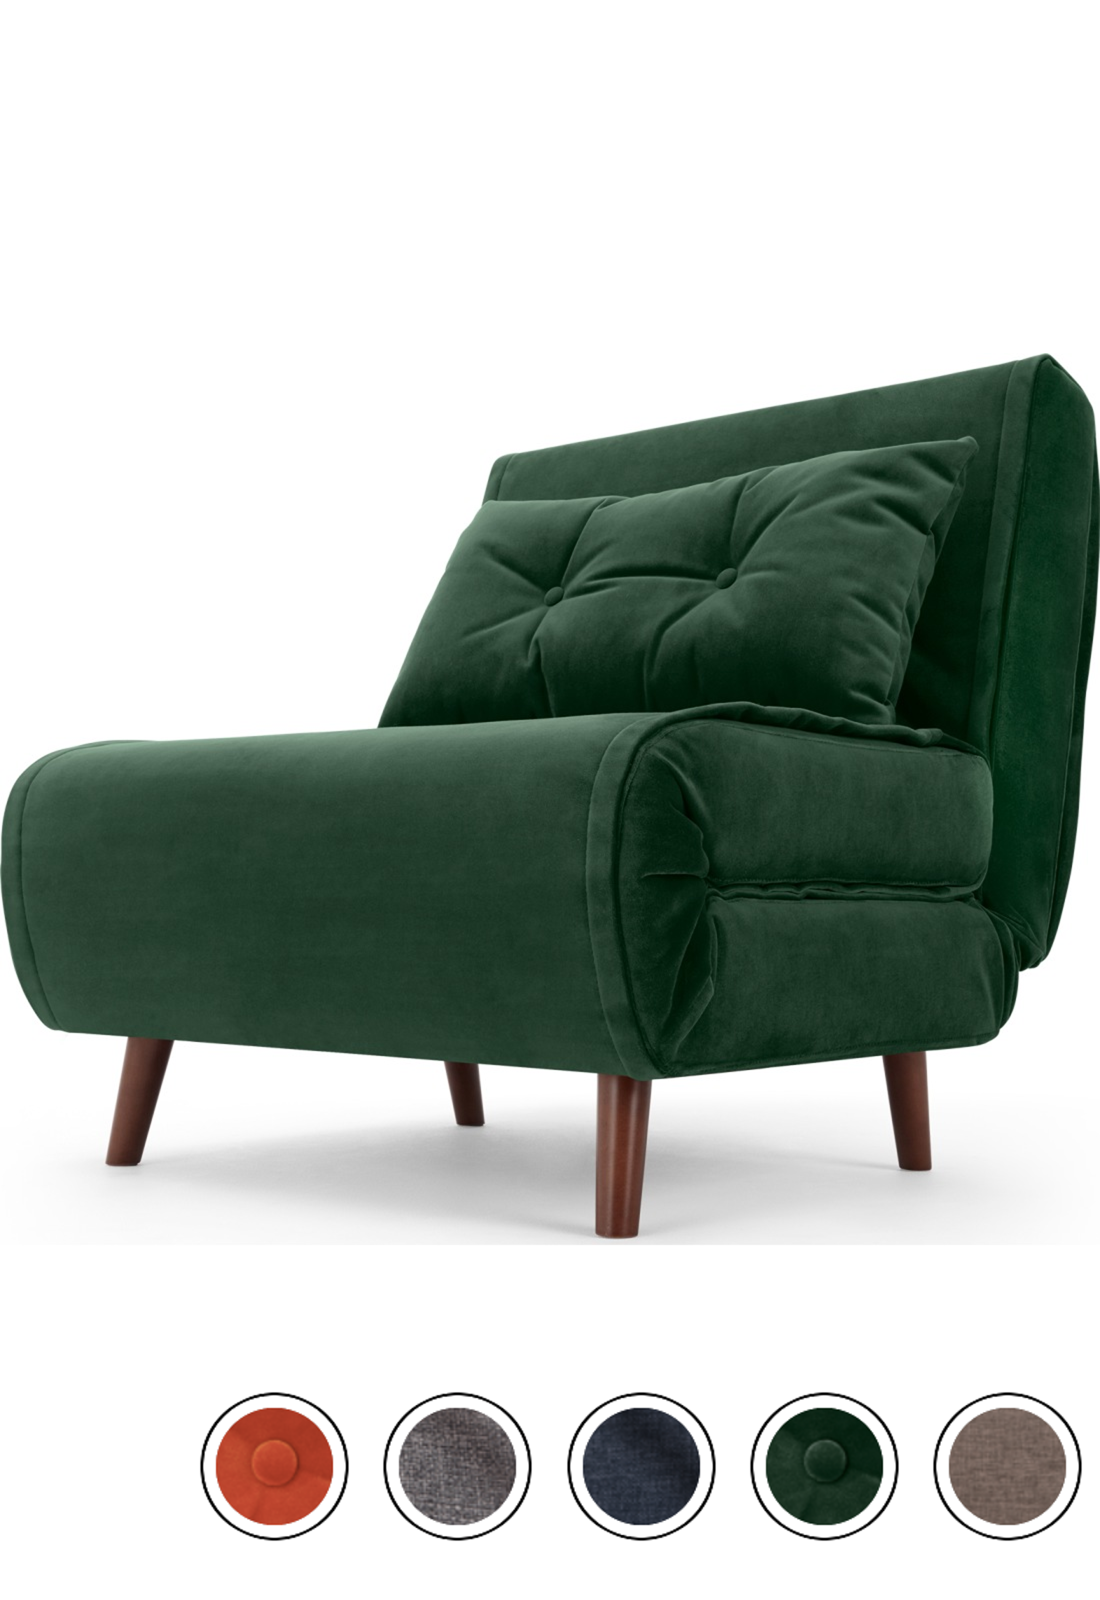 MADE pine green velvet Sofa bed Single sofa, Single sofa